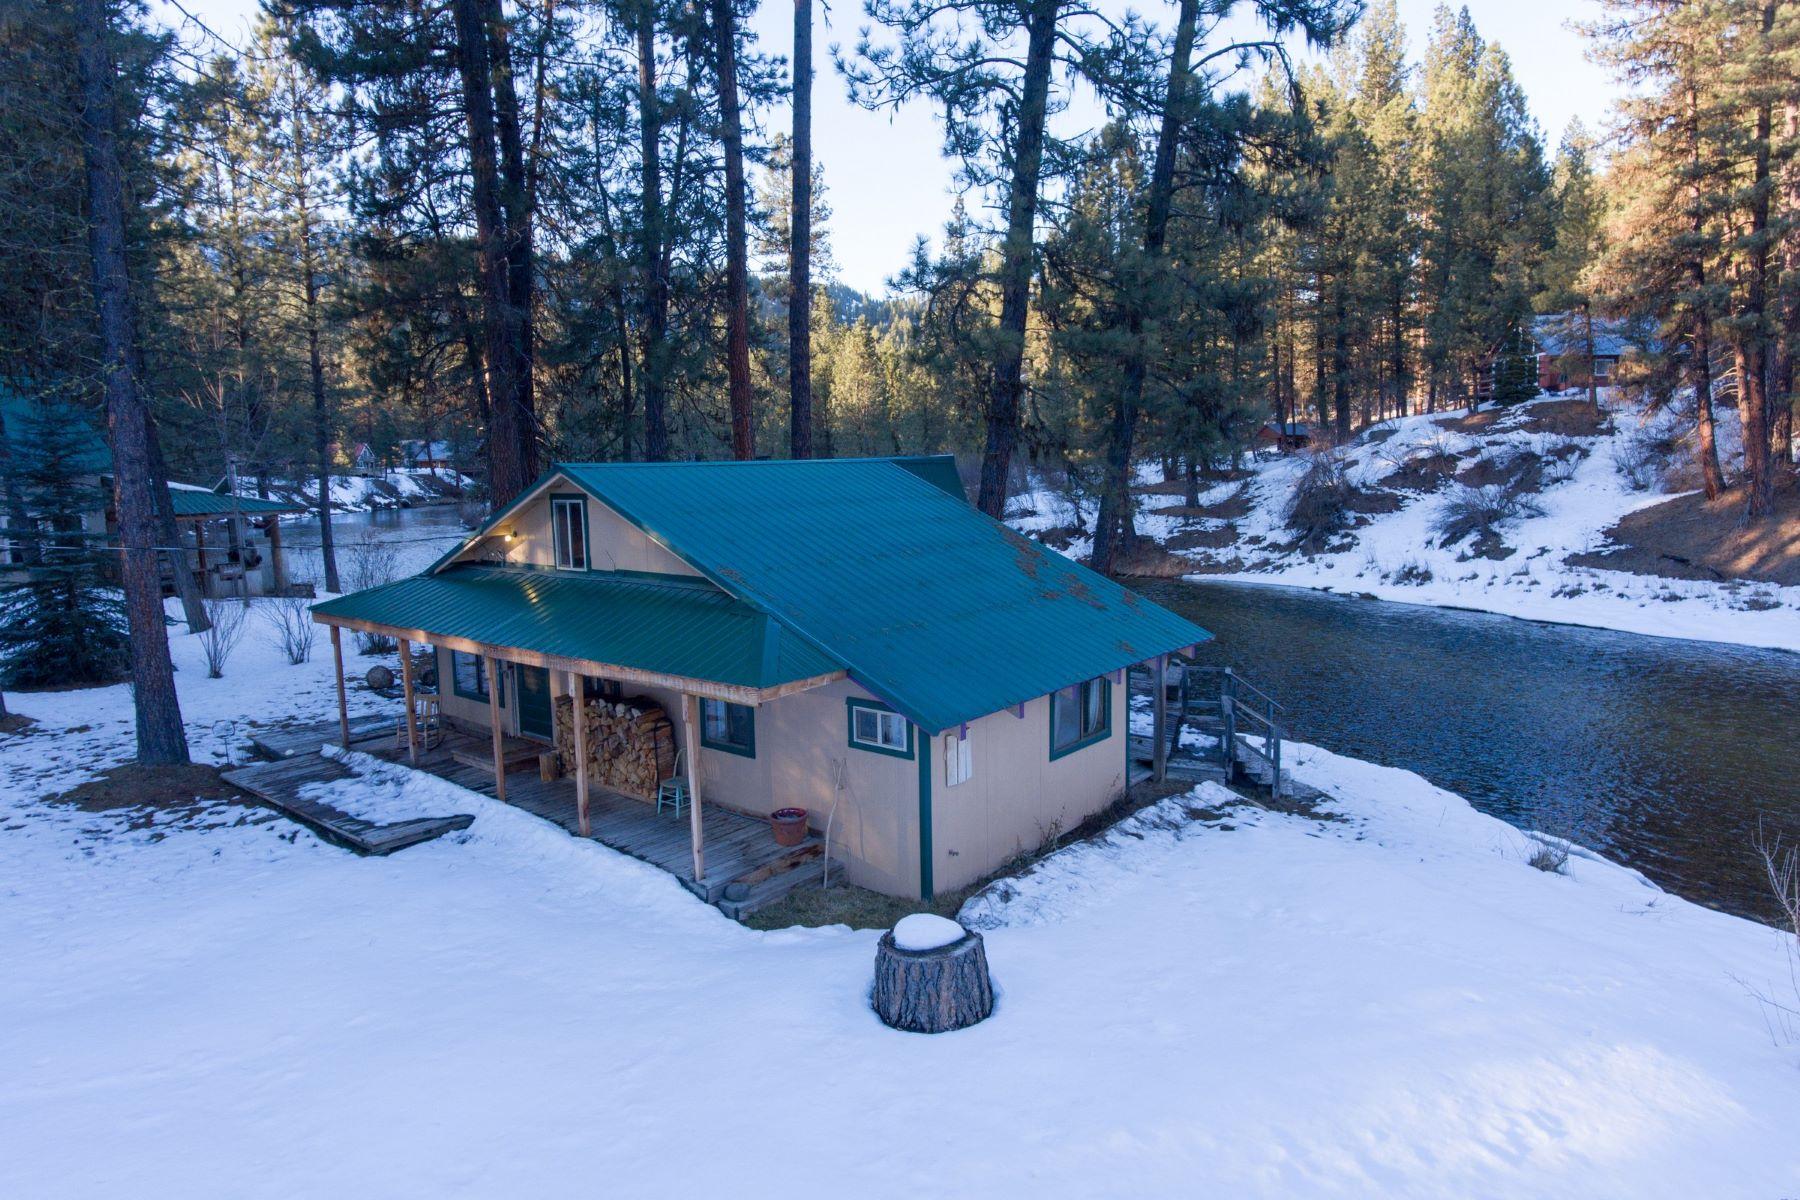 独户住宅 为 销售 在 20 Bunch Drive, Garden Valley Garden Valley, 爱达荷州, 83622 美国